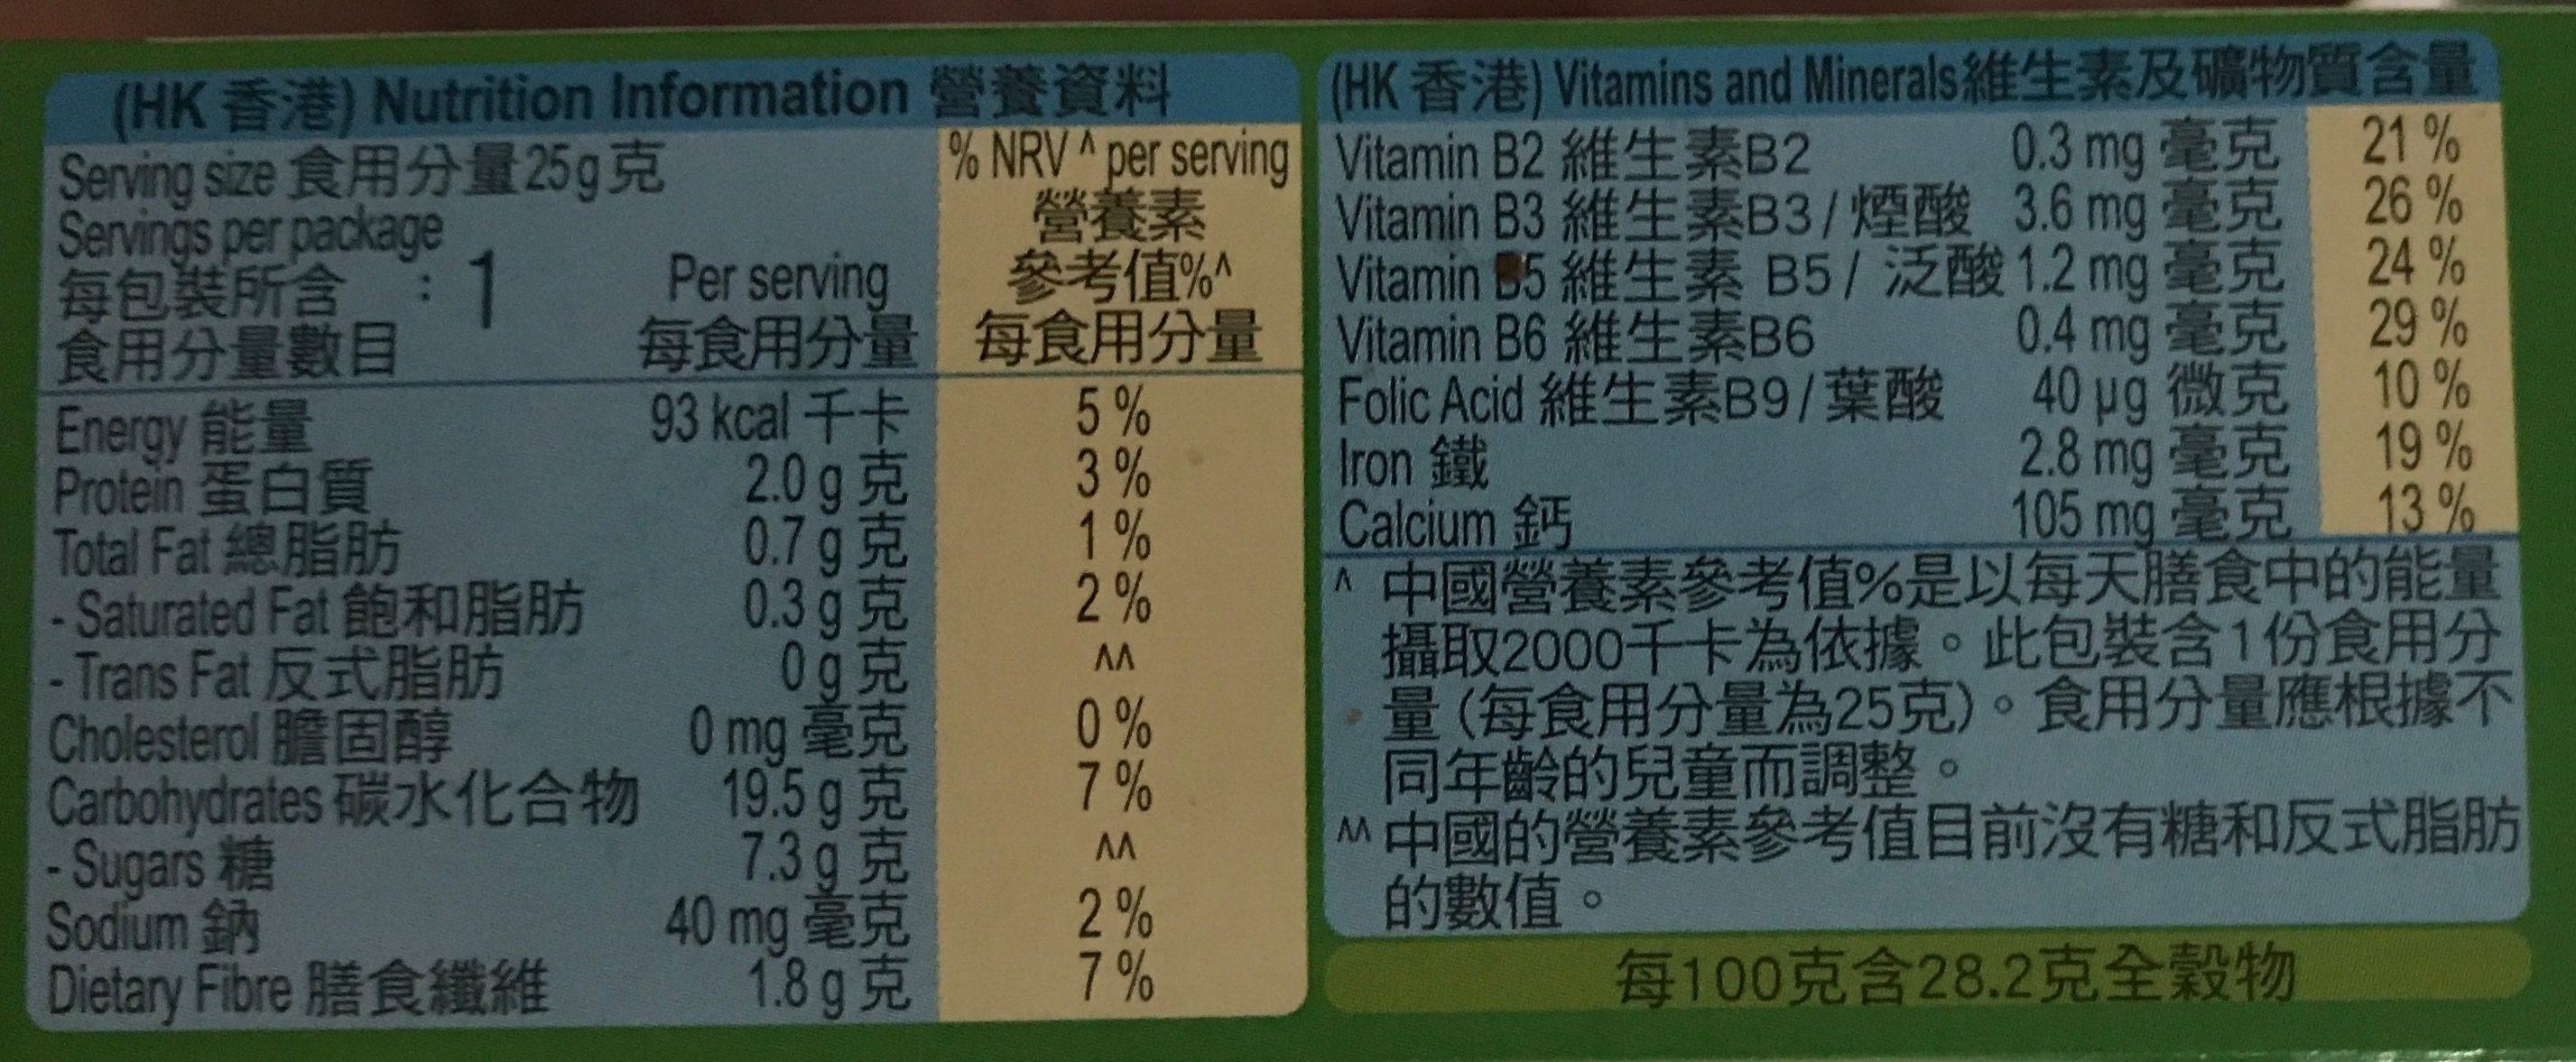 Nestle Milo Breakfast Cereal Chocolate Malt Flavoured 25 G. - Nutrition facts